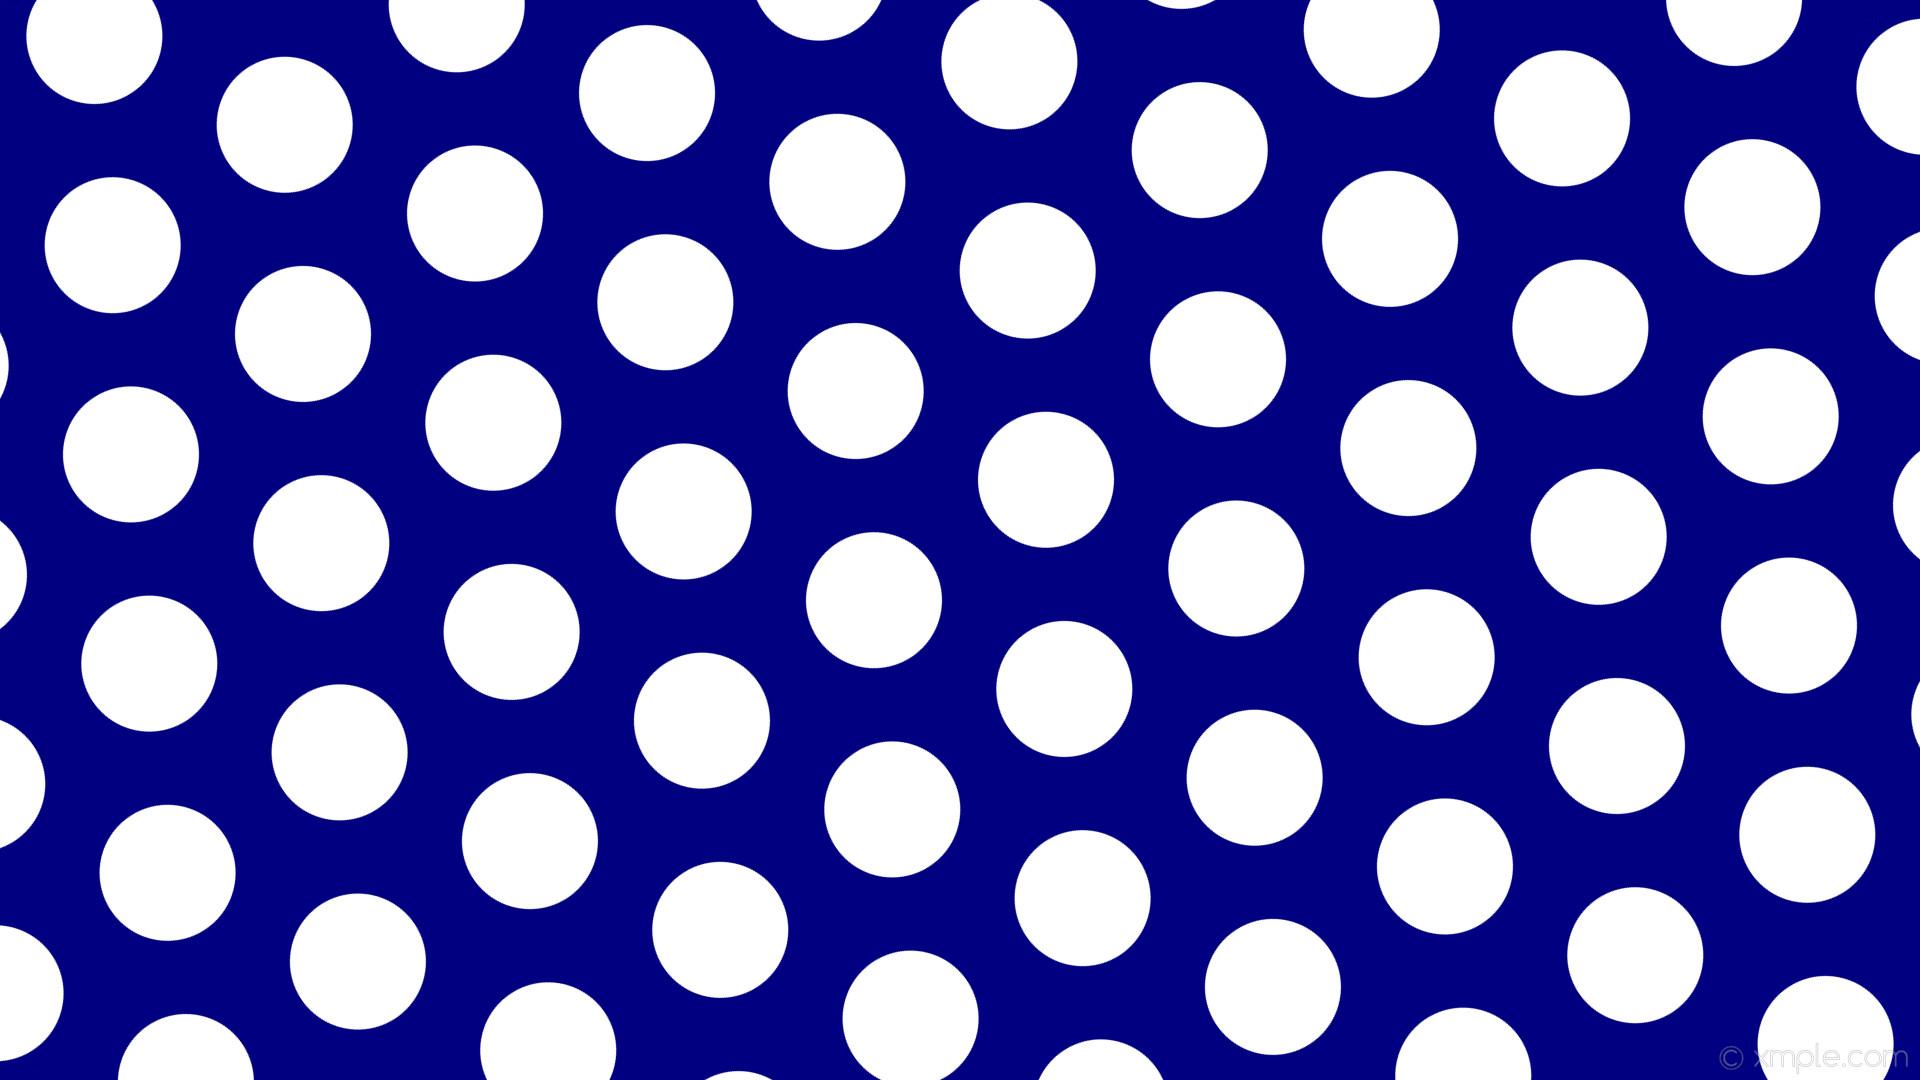 wallpaper hexagon blue white polka dots navy #000080 #ffffff diagonal 35°  136px 210px